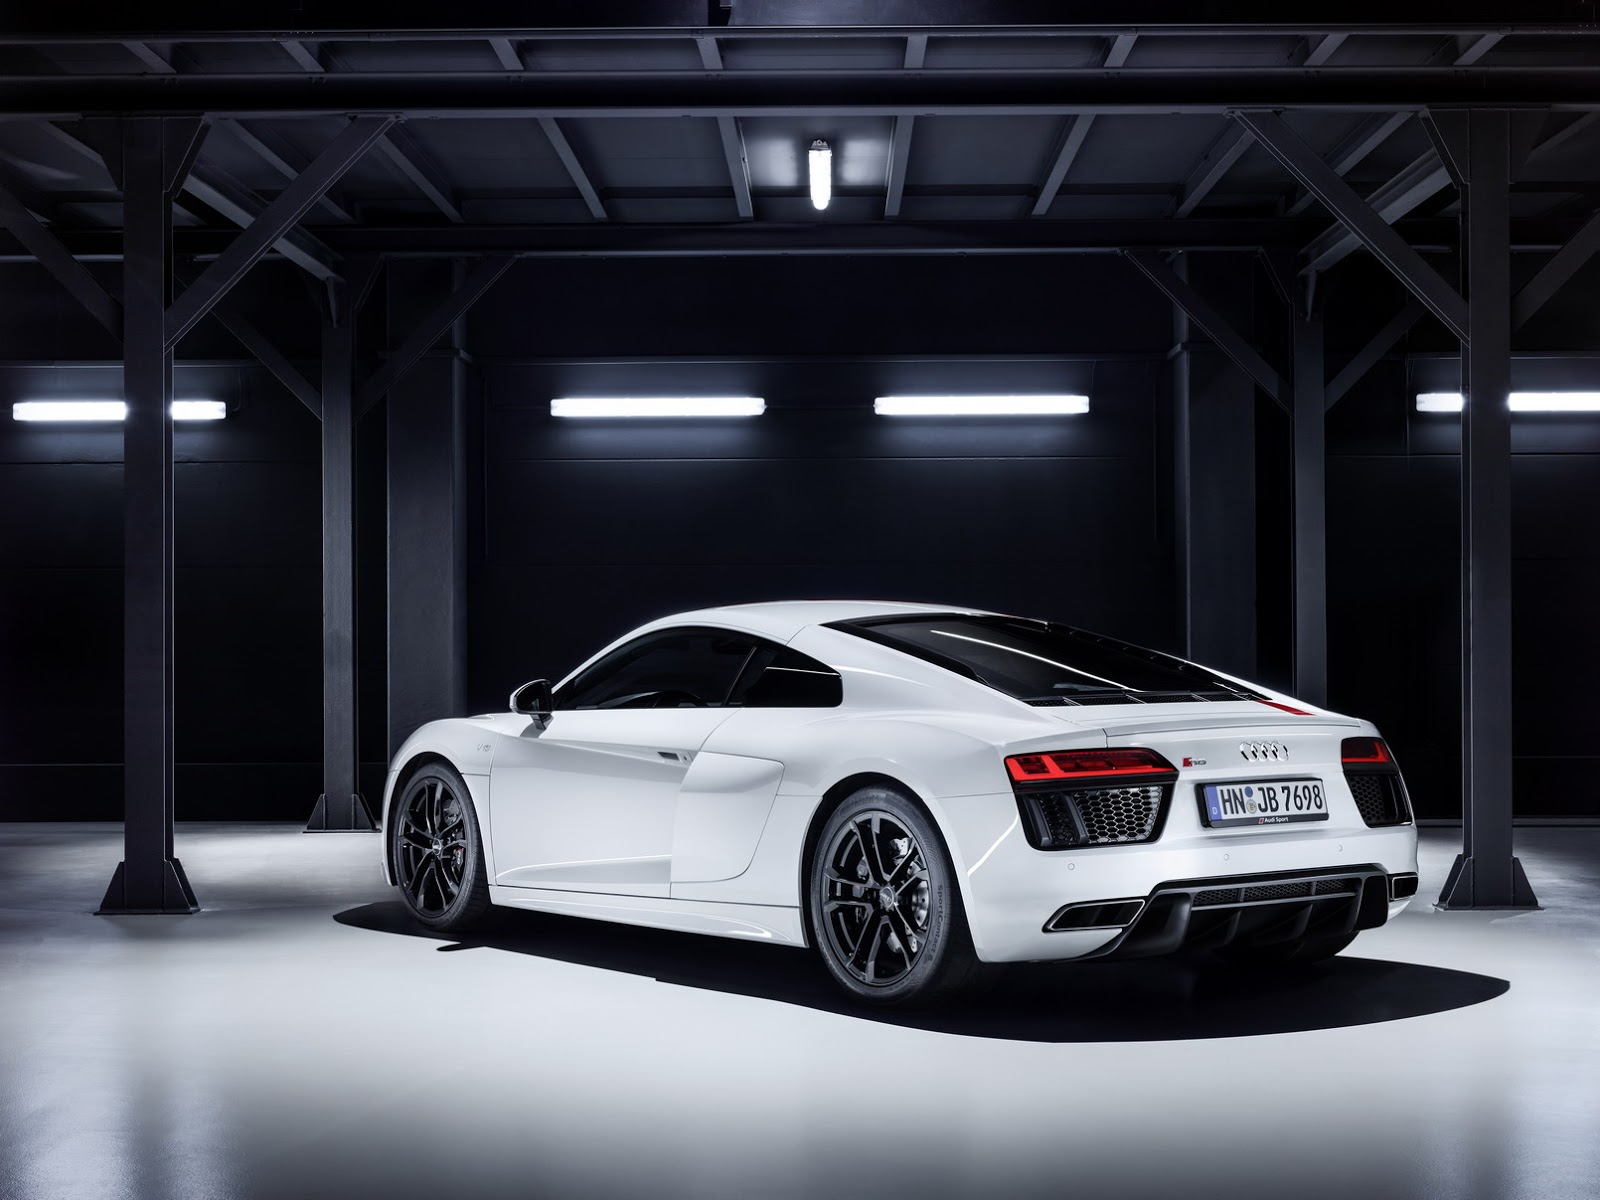 2018_Audi_R8_V10_RWS_43